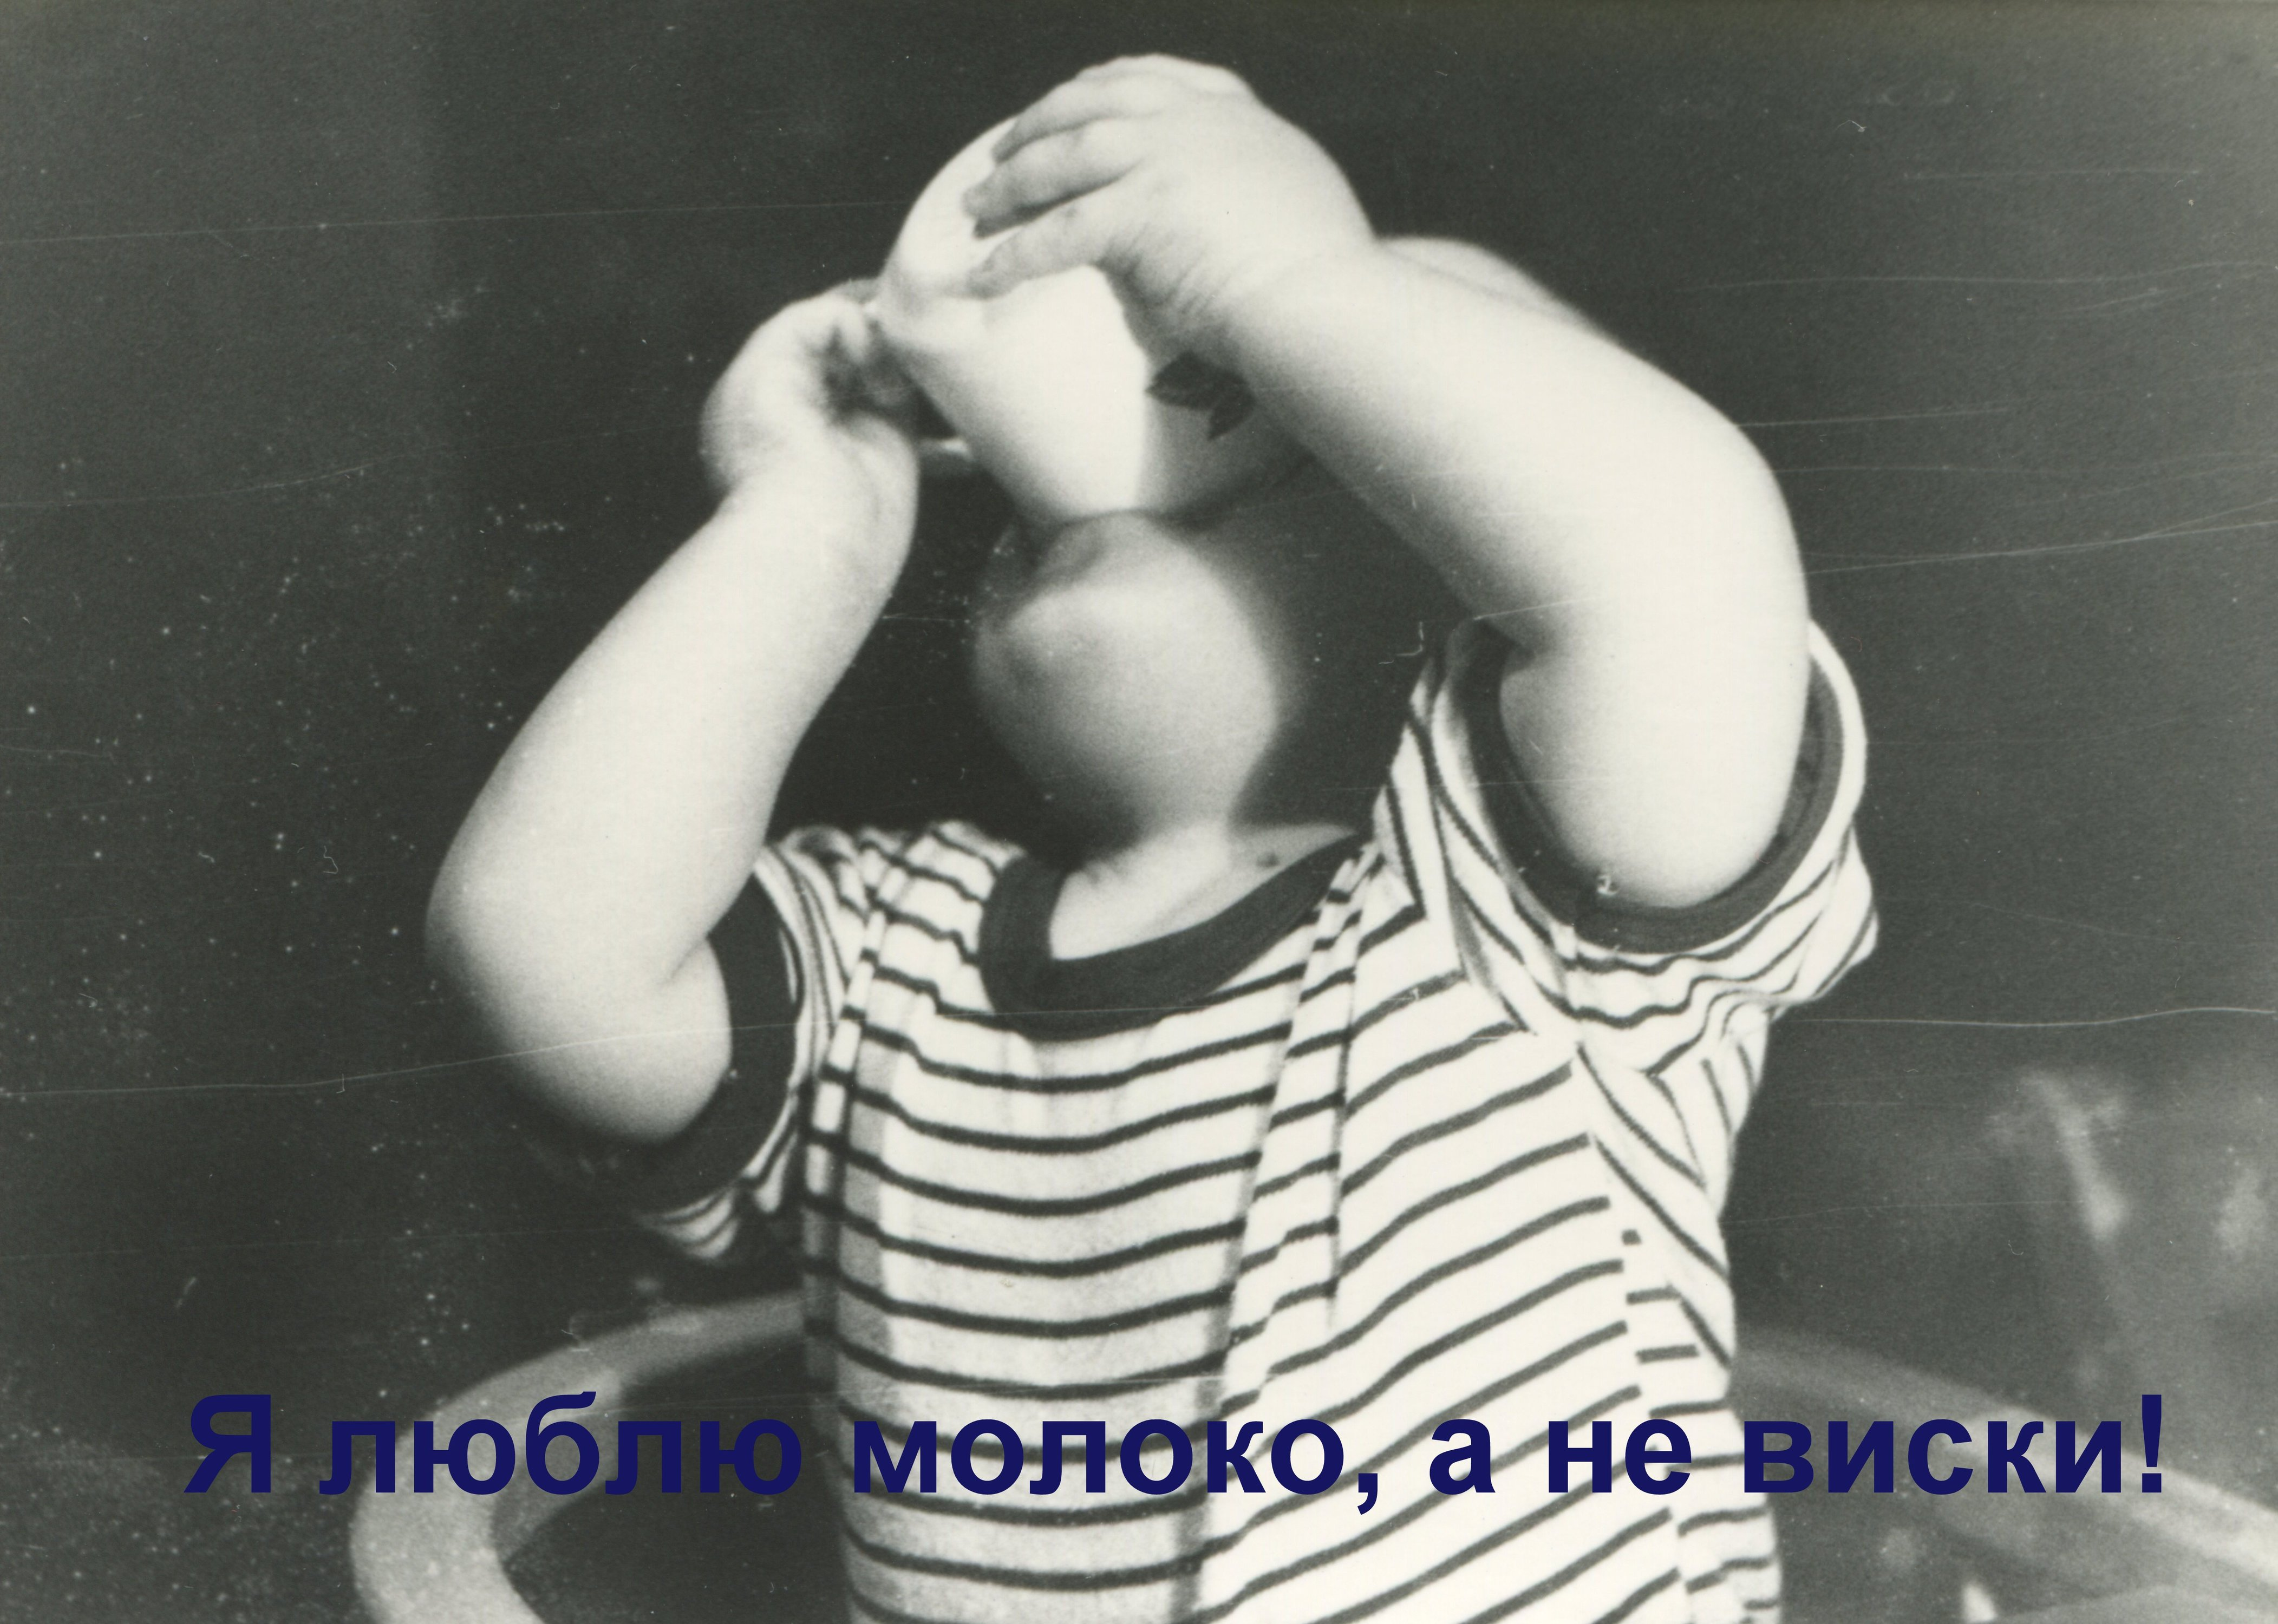 img108-1 (1).jpg